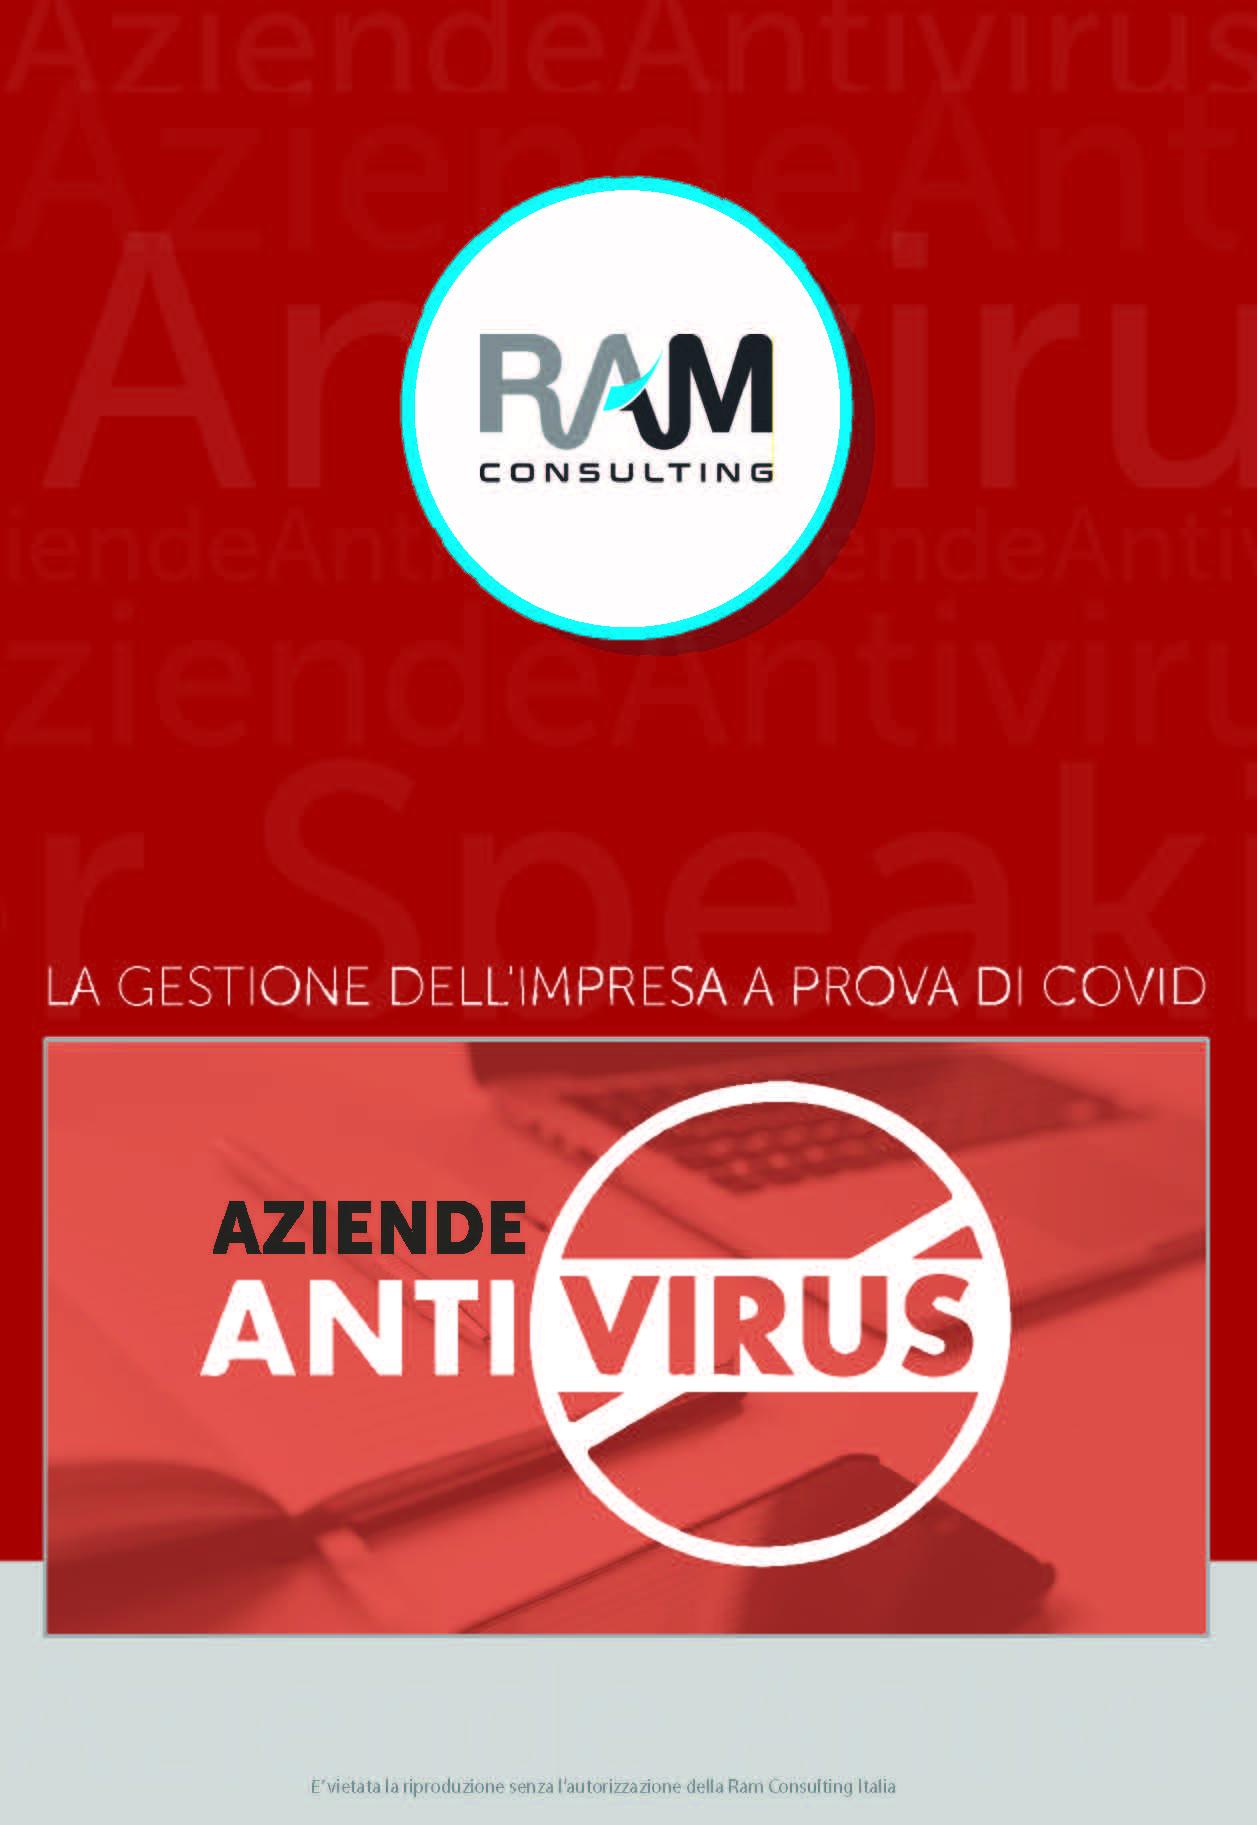 Aziende Antivirus